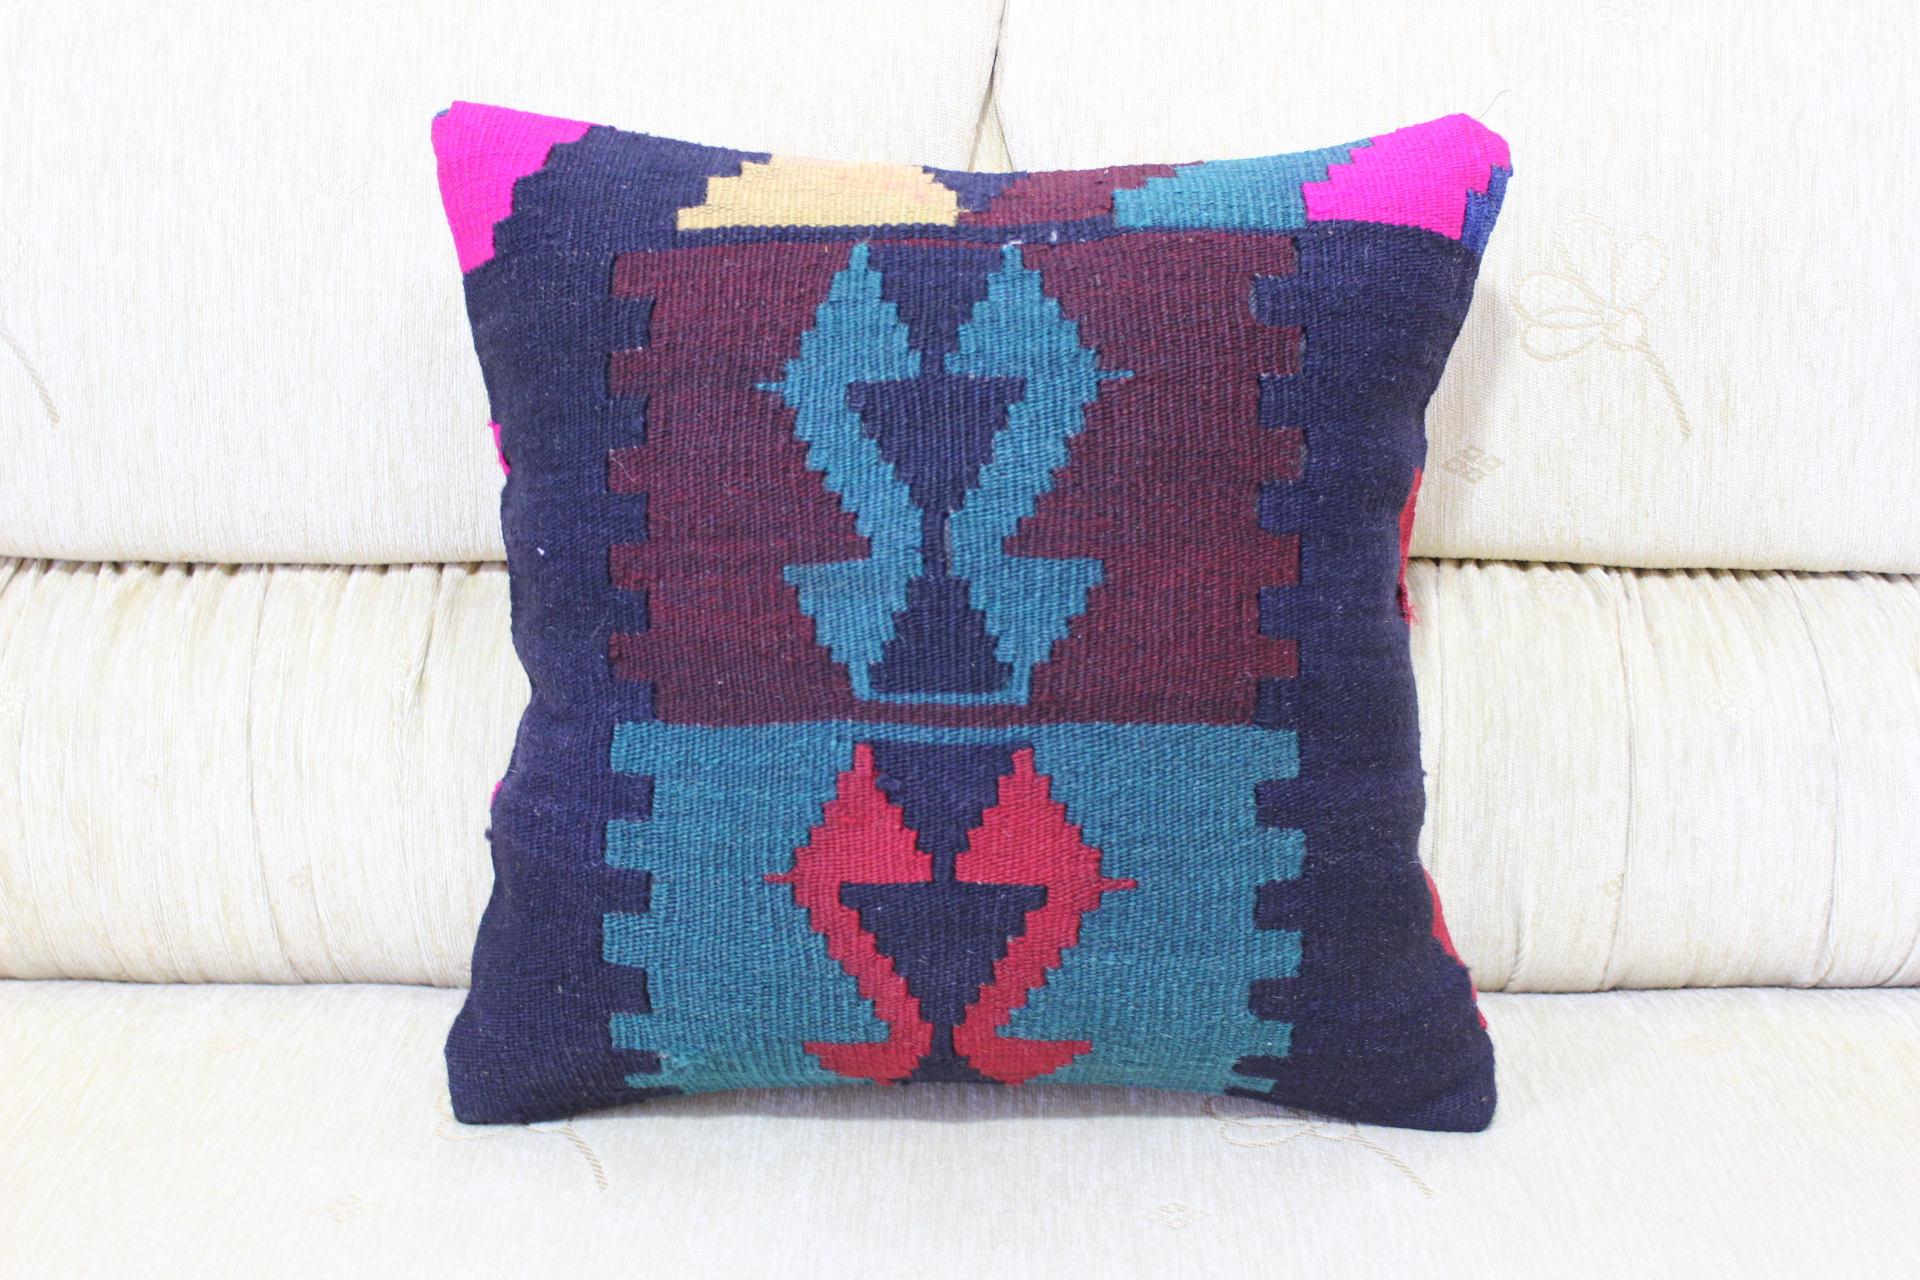 Geometric Pillow Rare Pillow Wonderfull Pillow Majestic Pillow 16x16 Aztec  Pillow Throw Pillow Patterned Pillow Handwoven